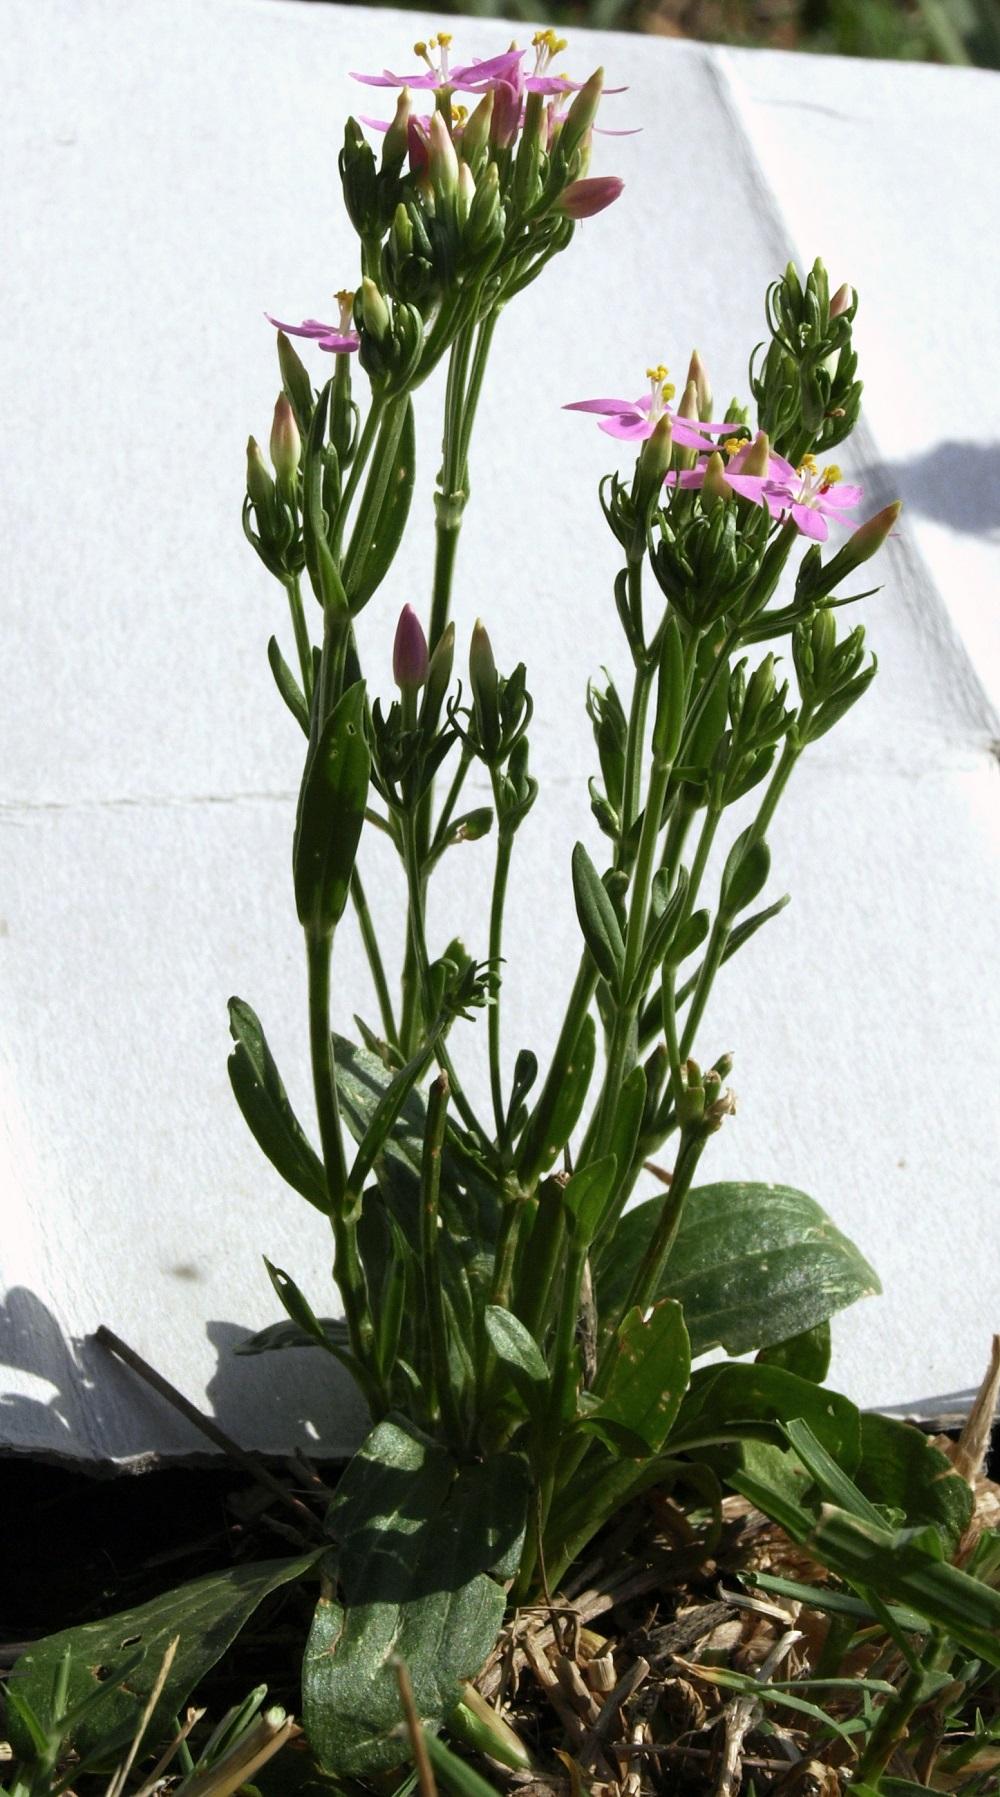 Inconnue dans mon jardin: Centaurium erythraea-[Identification] F1_12c10